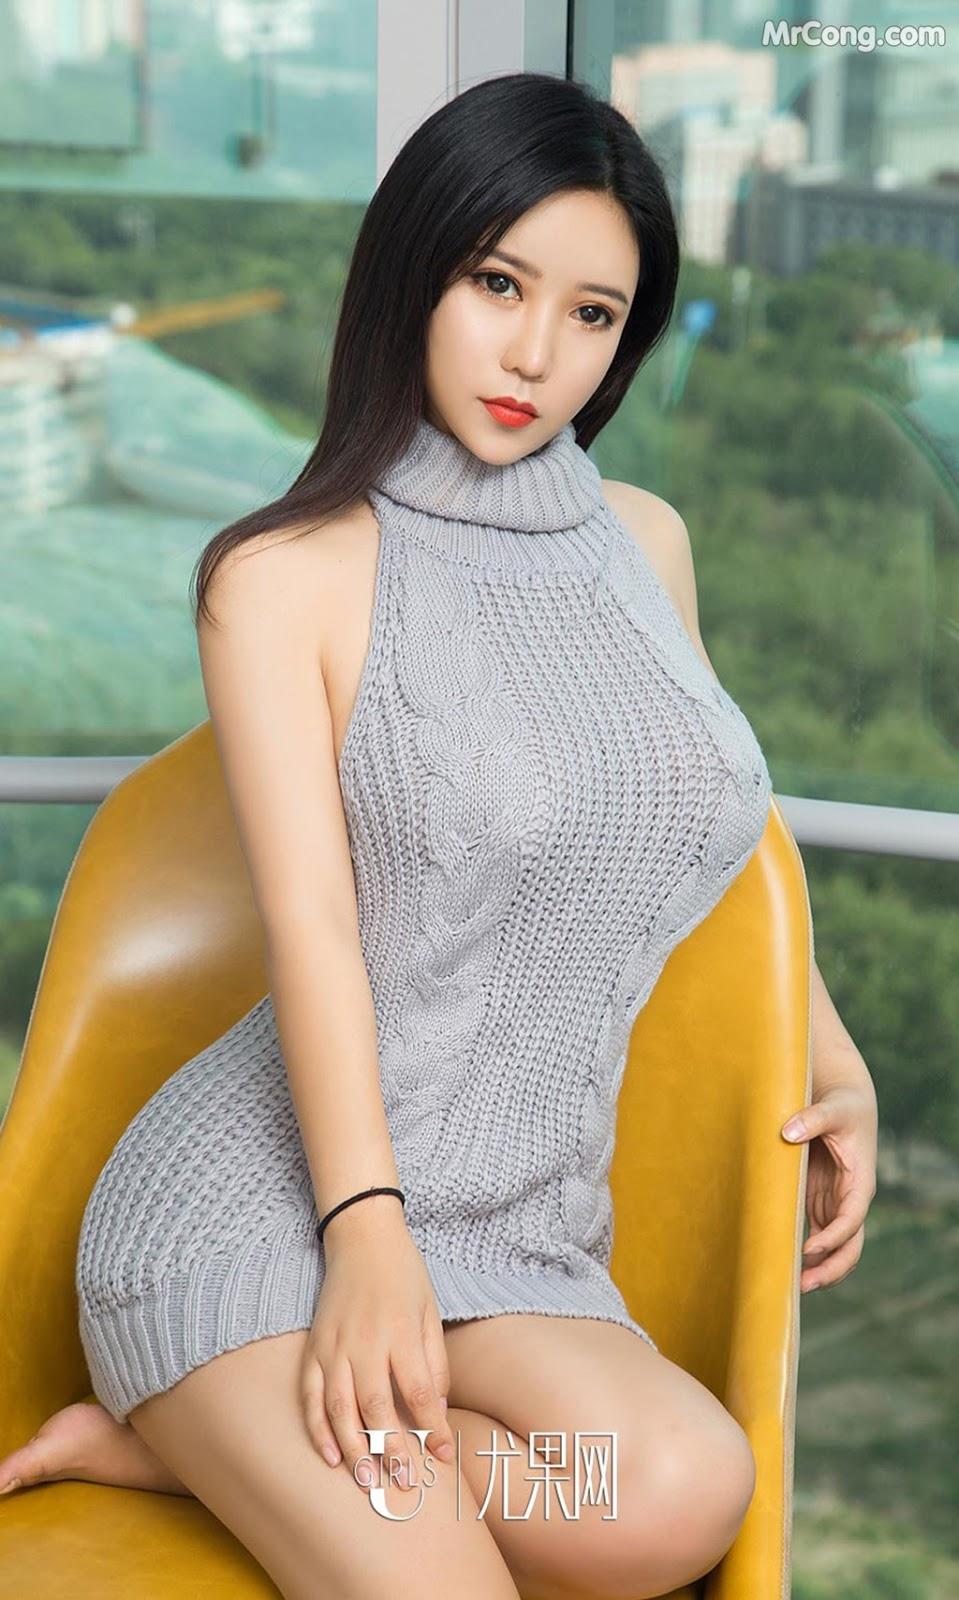 Image UGIRLS-Ai-You-Wu-App-No.1129-Ai-Na-MrCong.com-005 in post UGIRLS – Ai You Wu App No.1129: Người mẫu Ai Na (艾娜) (35 ảnh)